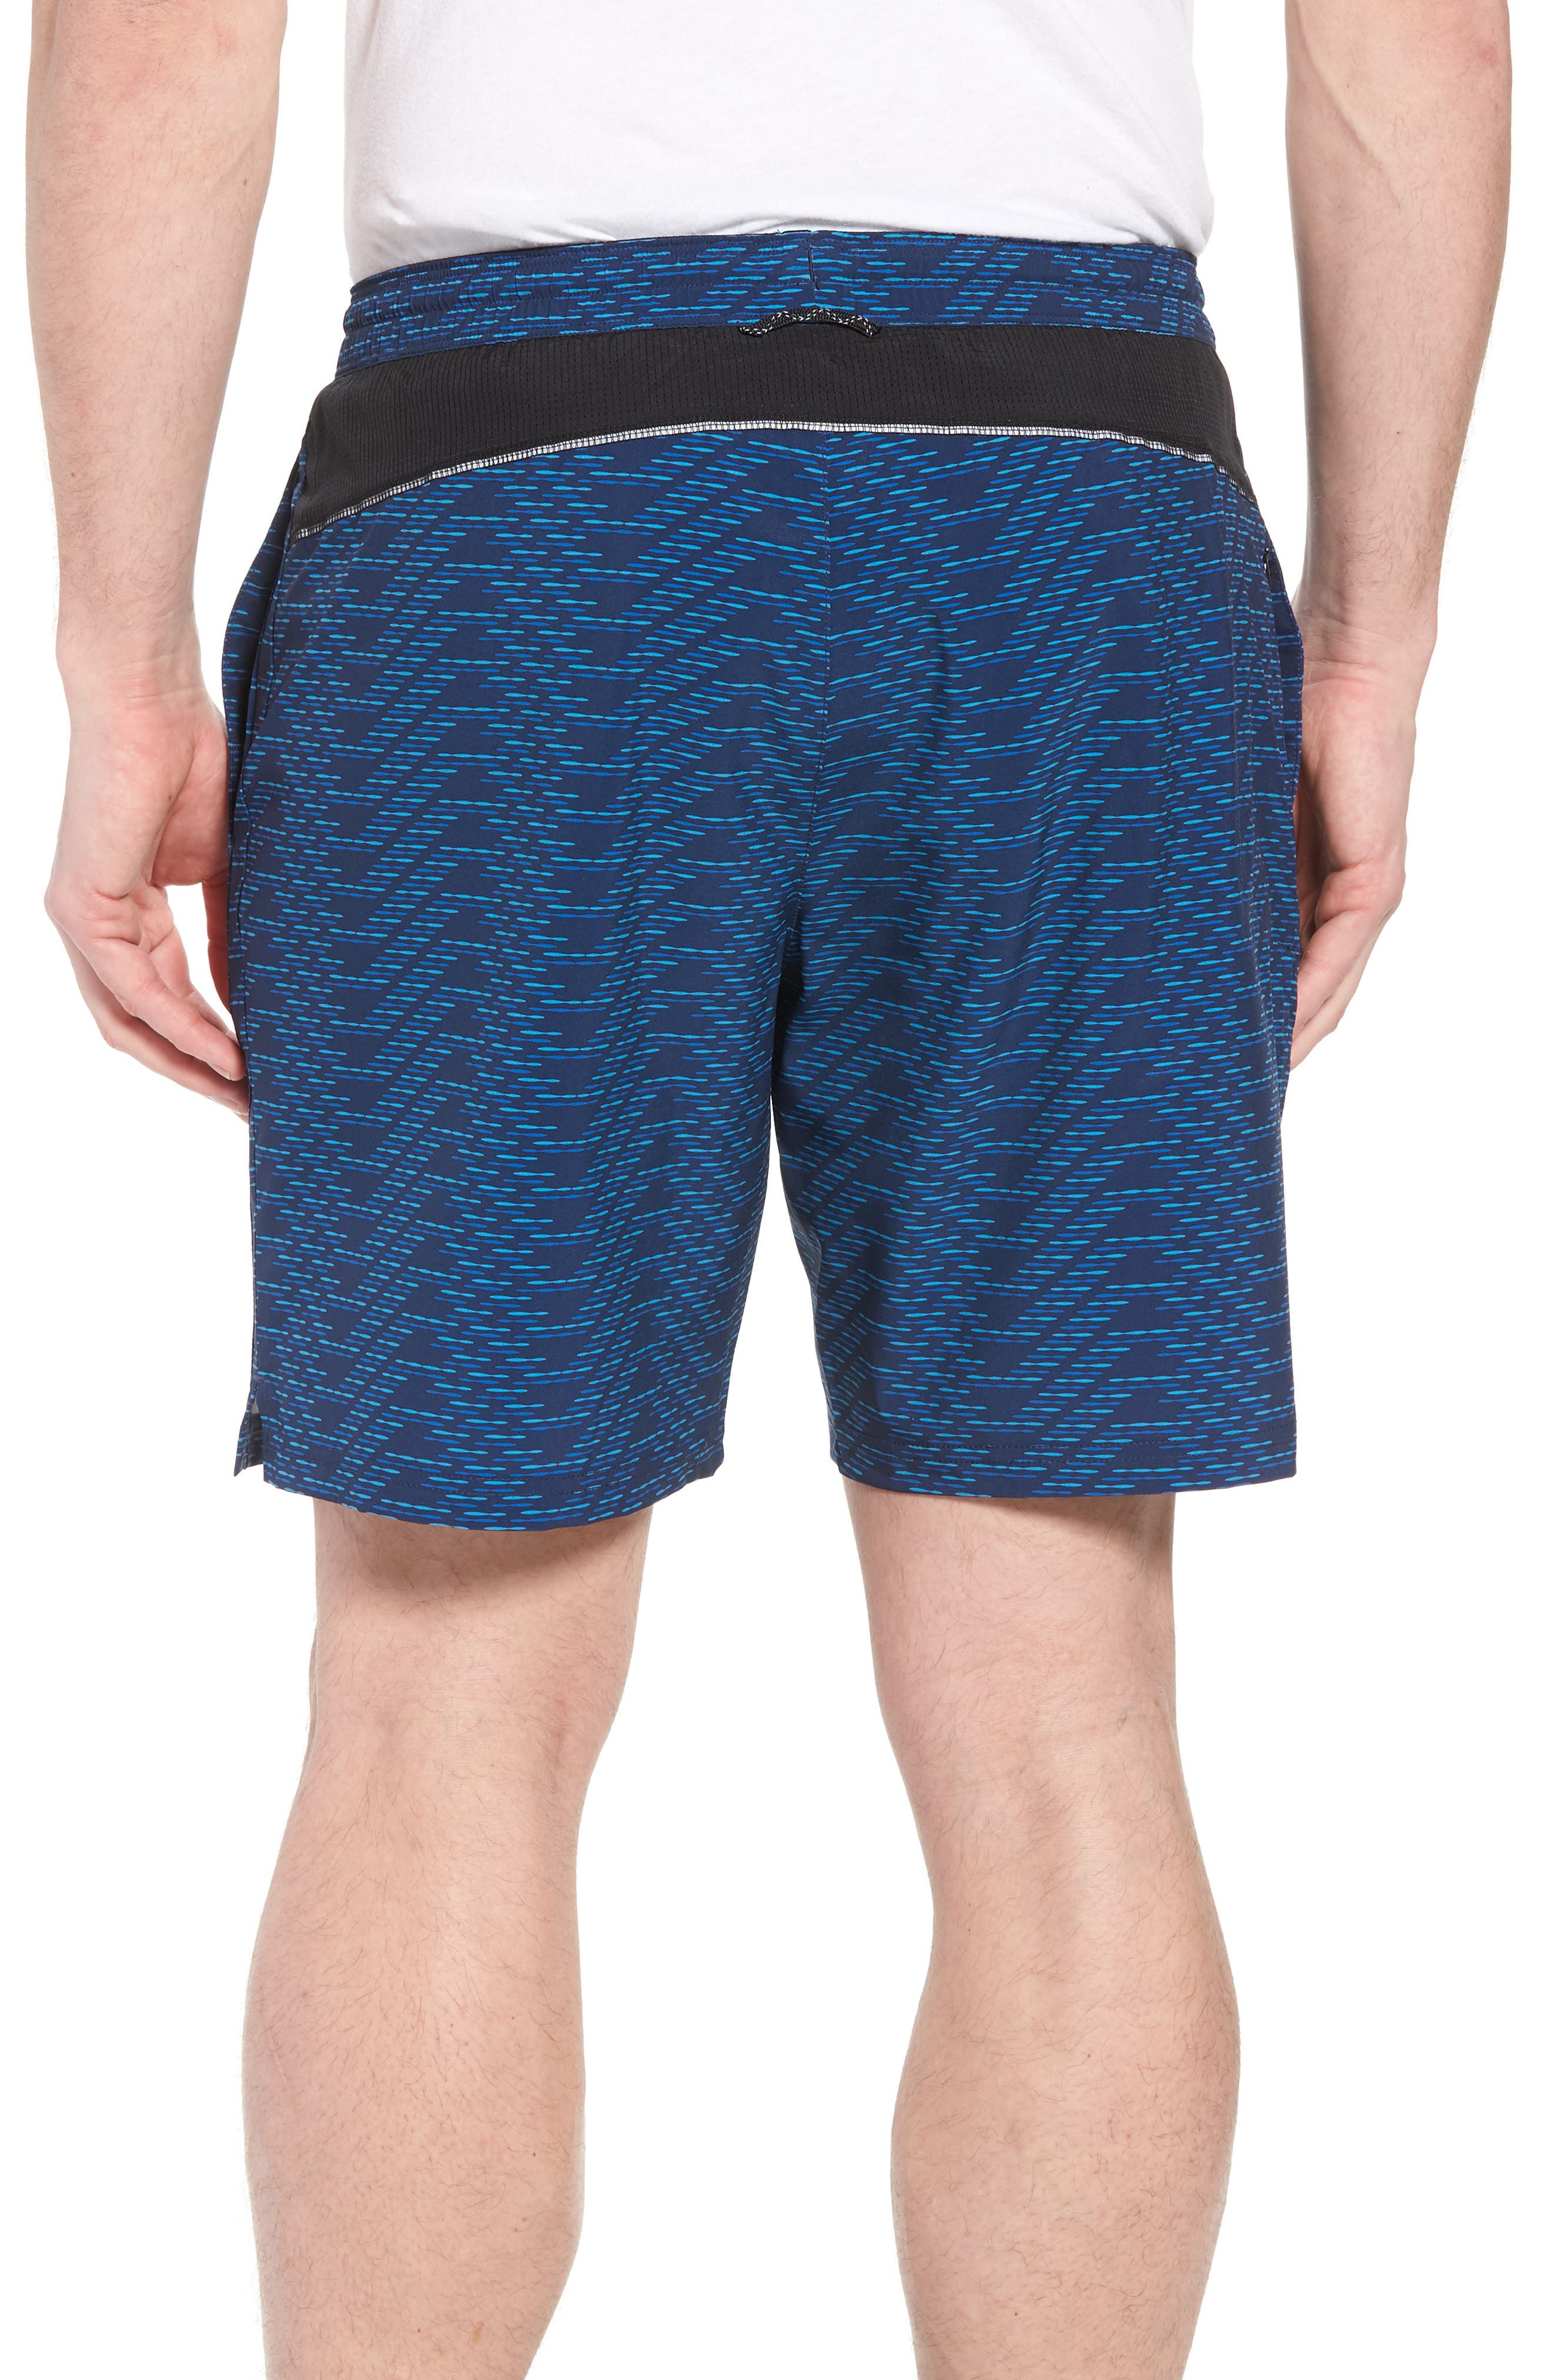 Stretch Shorts,                             Alternate thumbnail 2, color,                             CIRCUIT BREAKER